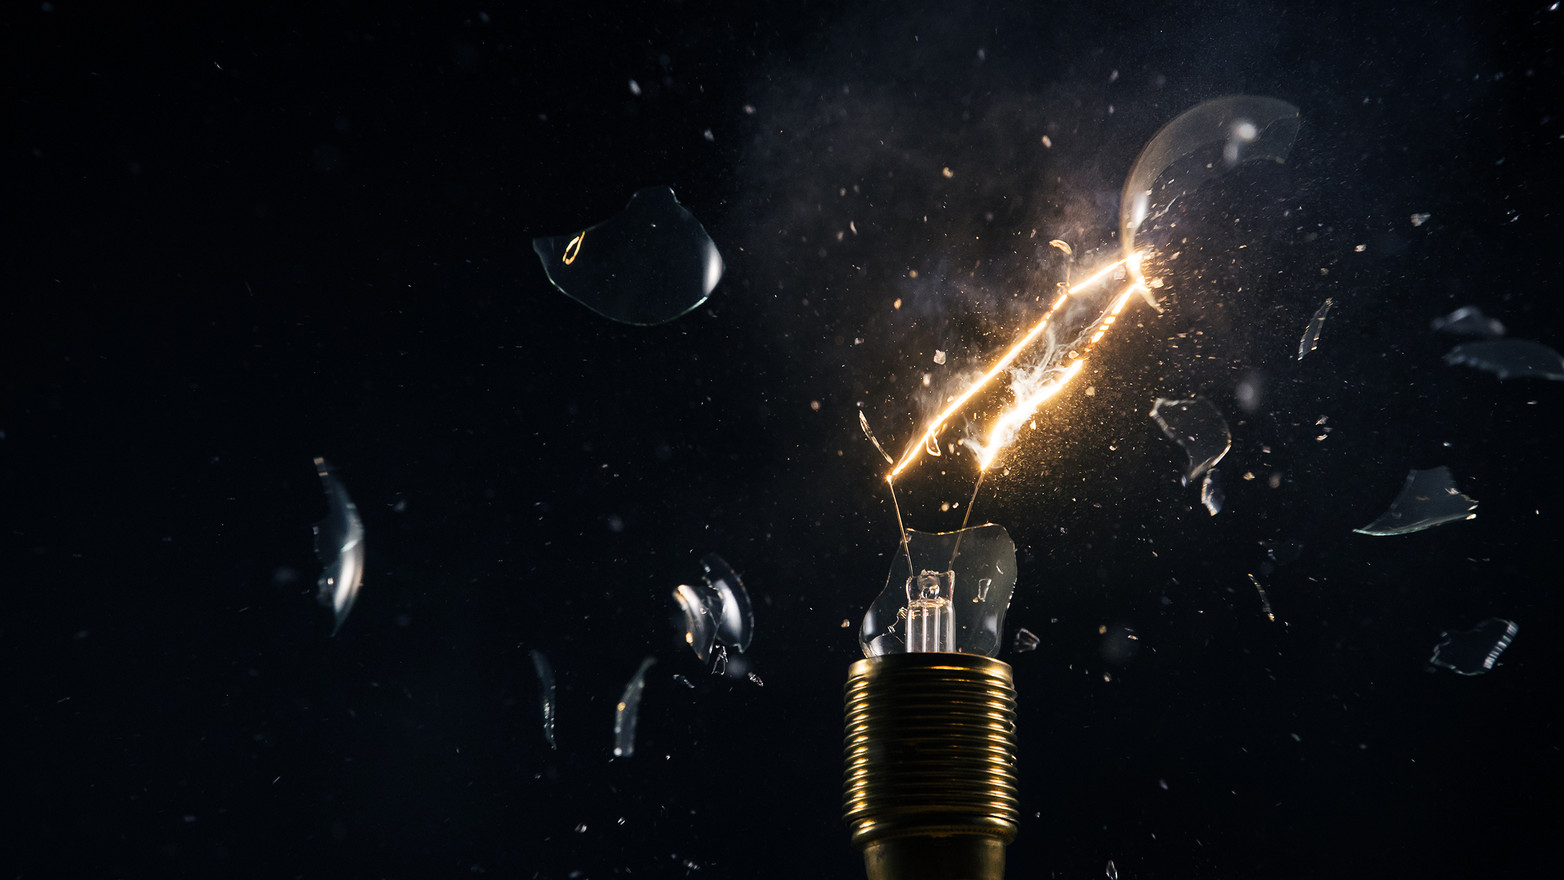 light-bulb-explosion-freeze-black-1.jpg